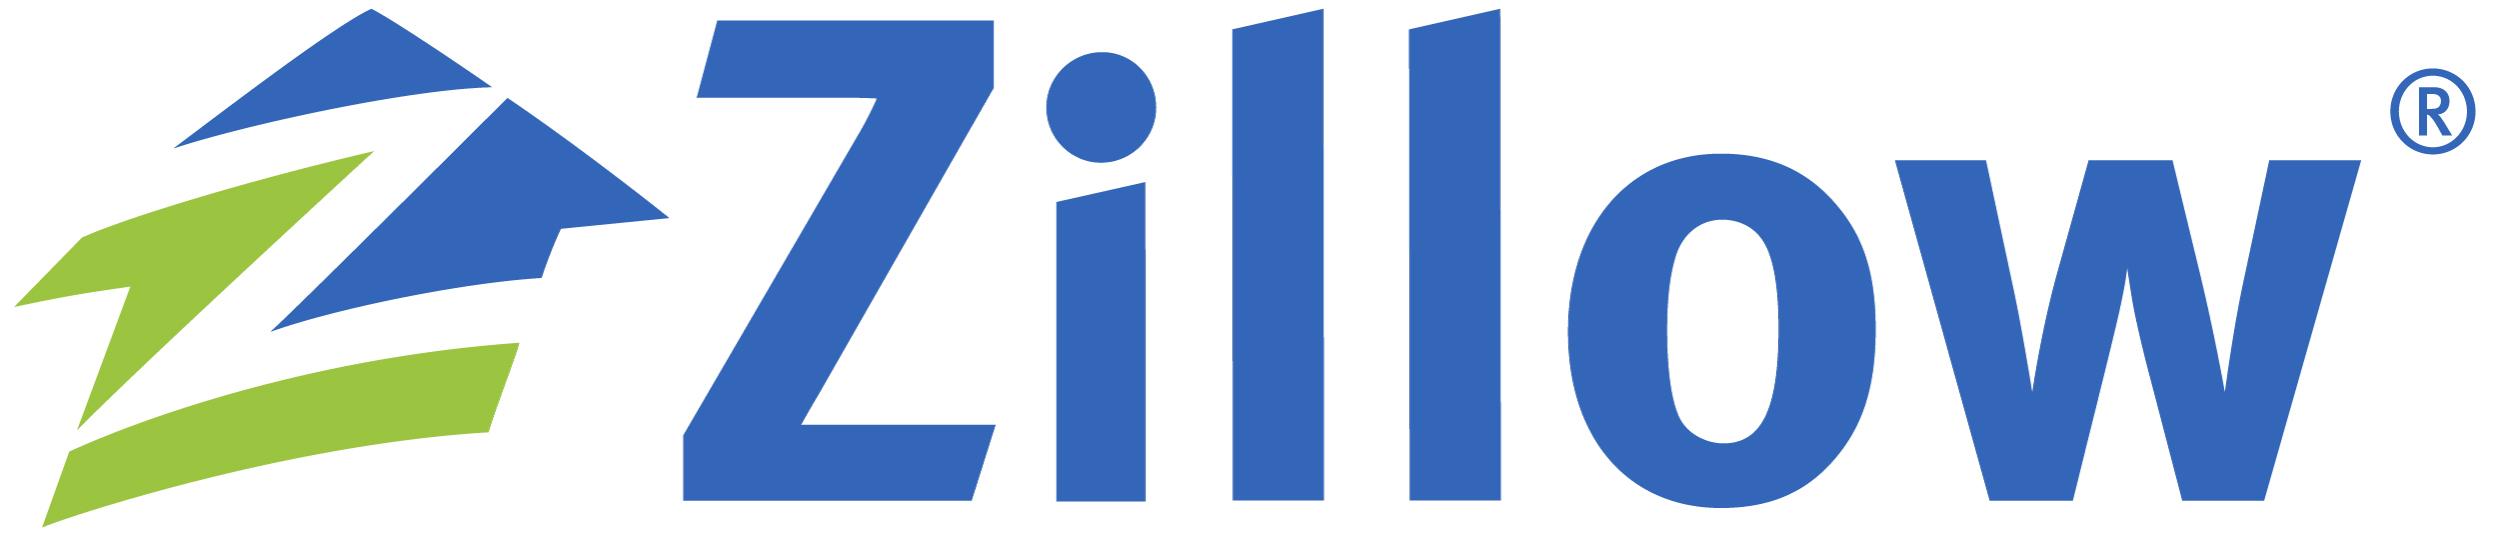 zillow_logo_RGB_2500px